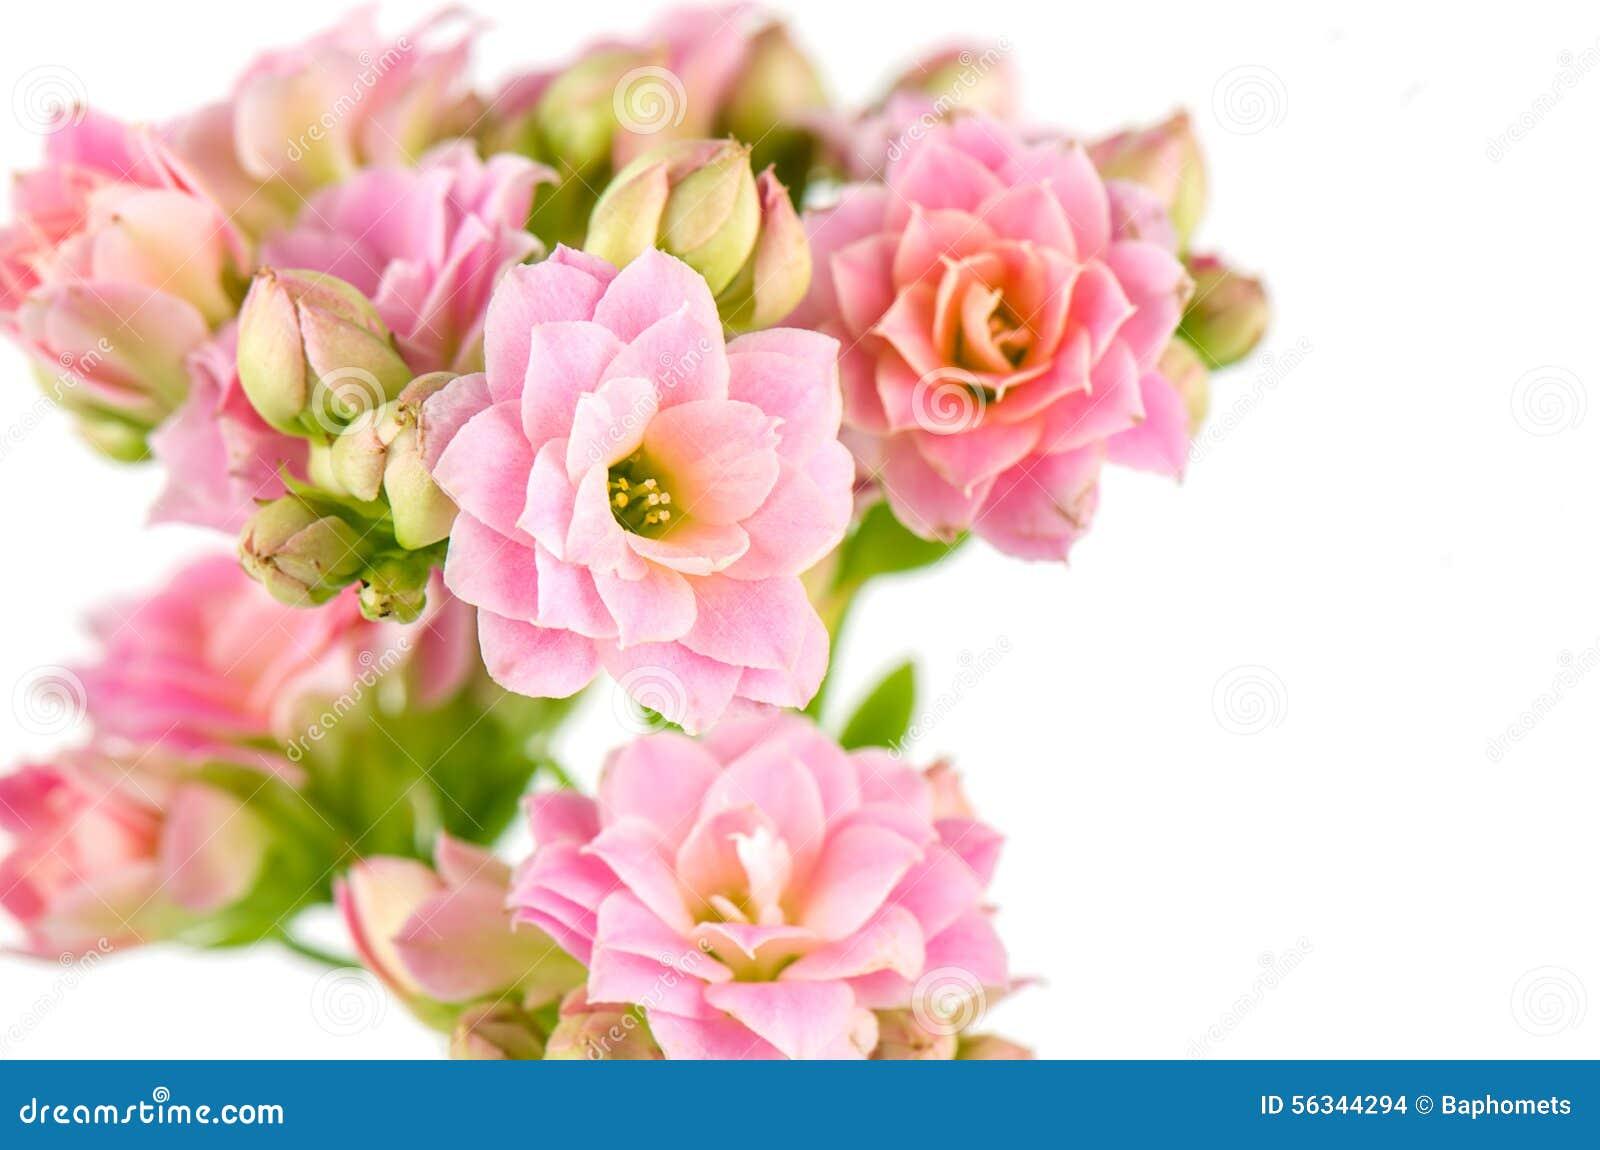 pink flowers on white background kalanchoe blossfeldiana